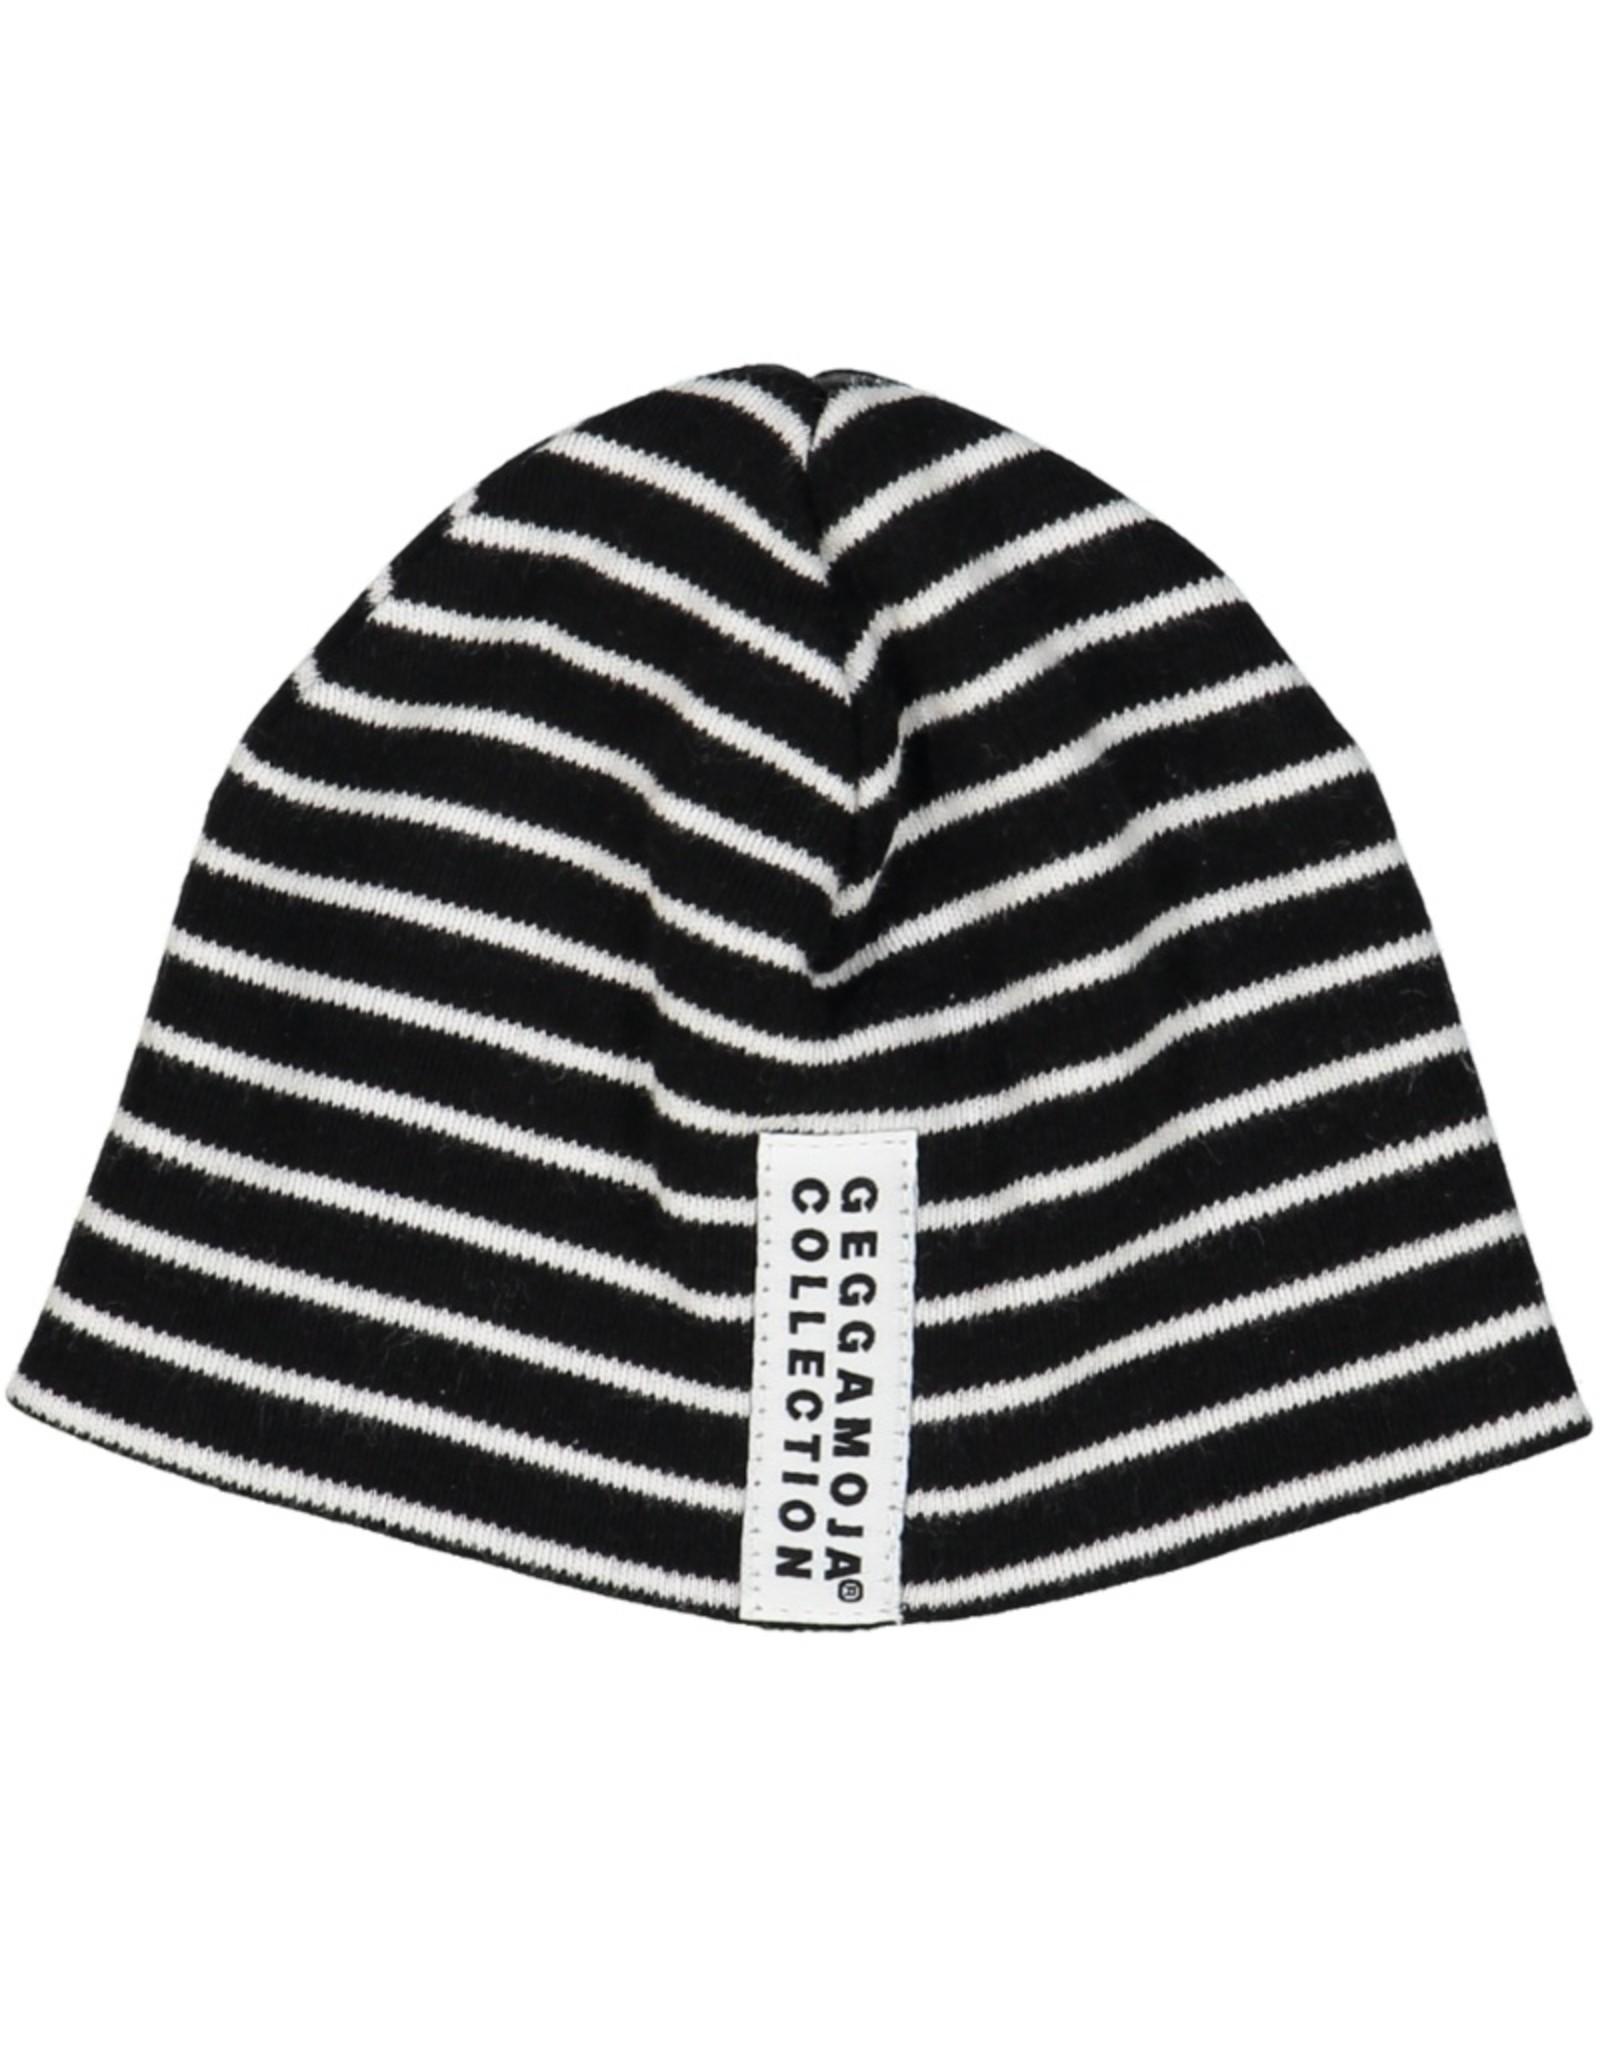 Geggamoja Premature hat - black